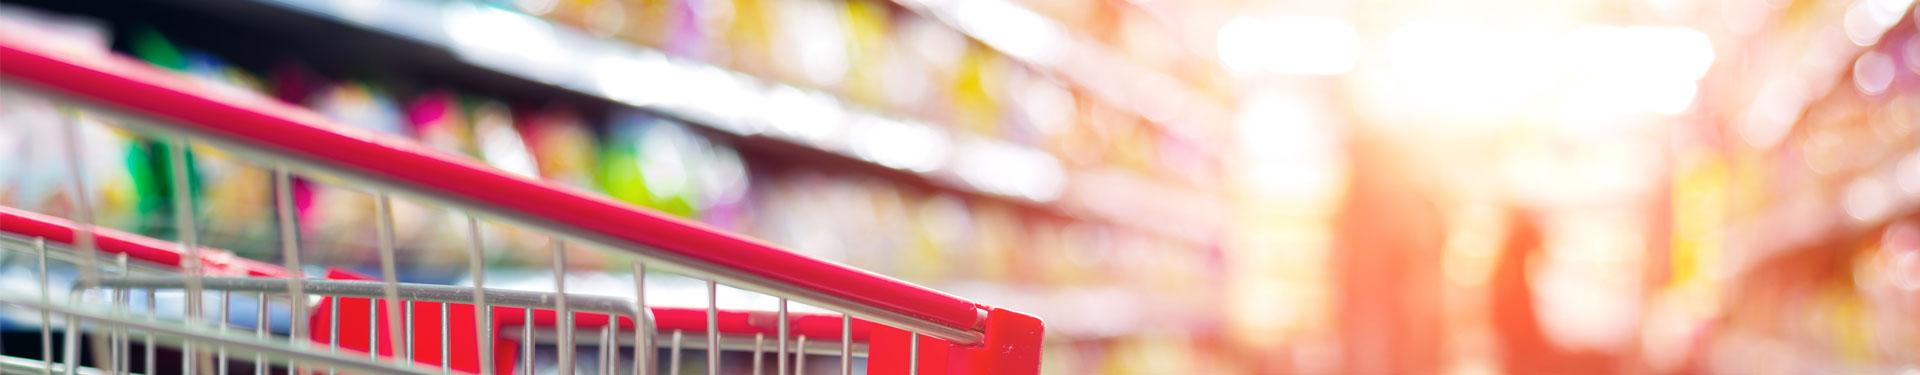 Supermarchés UFE Pérou